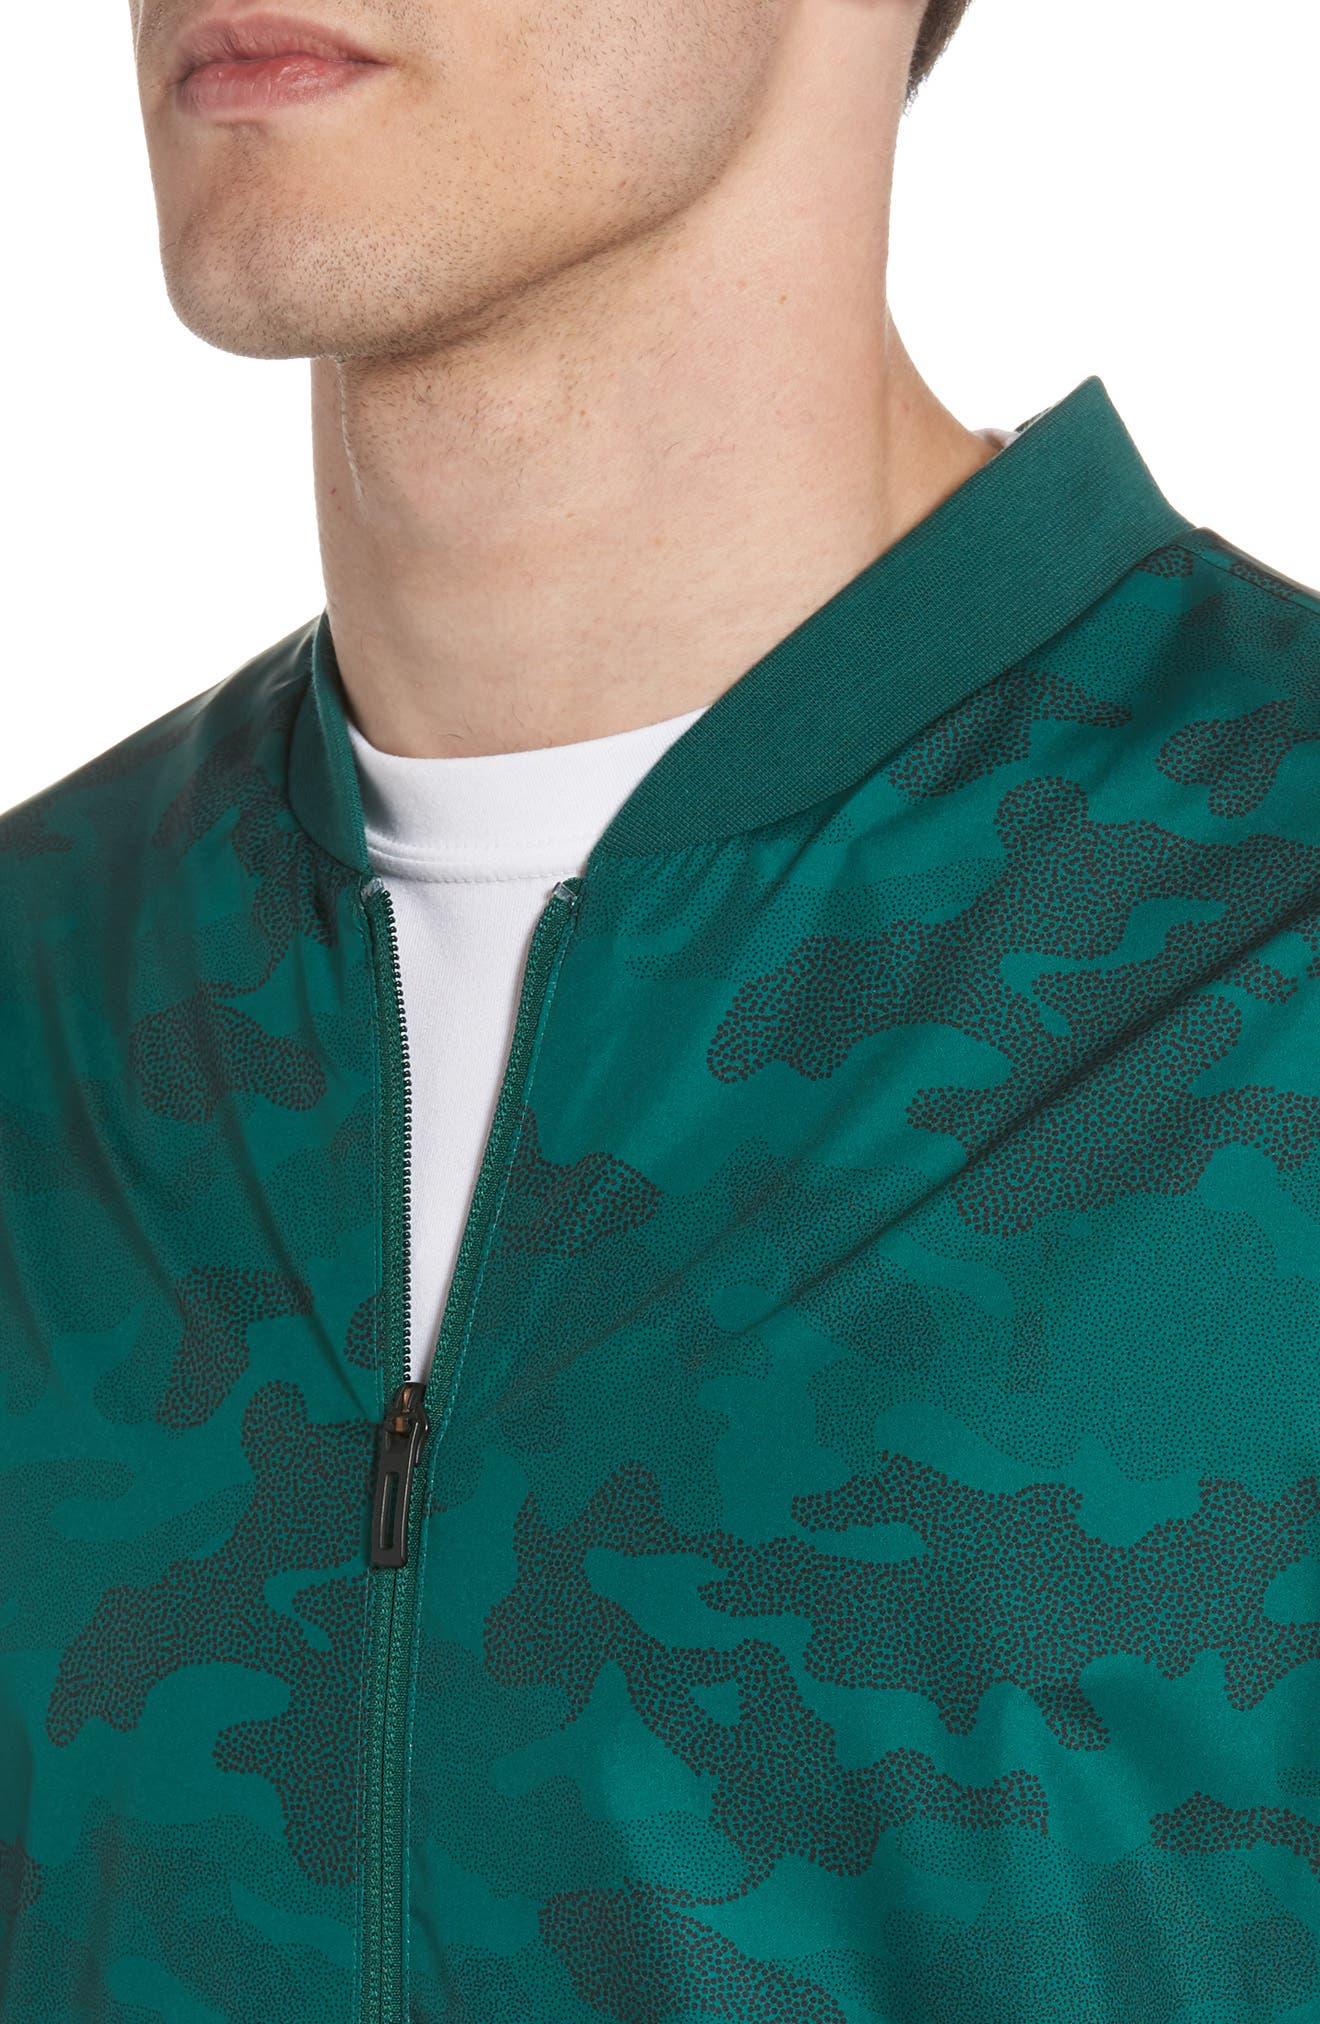 Regular Fit Track Jacket,                             Alternate thumbnail 4, color,                             305